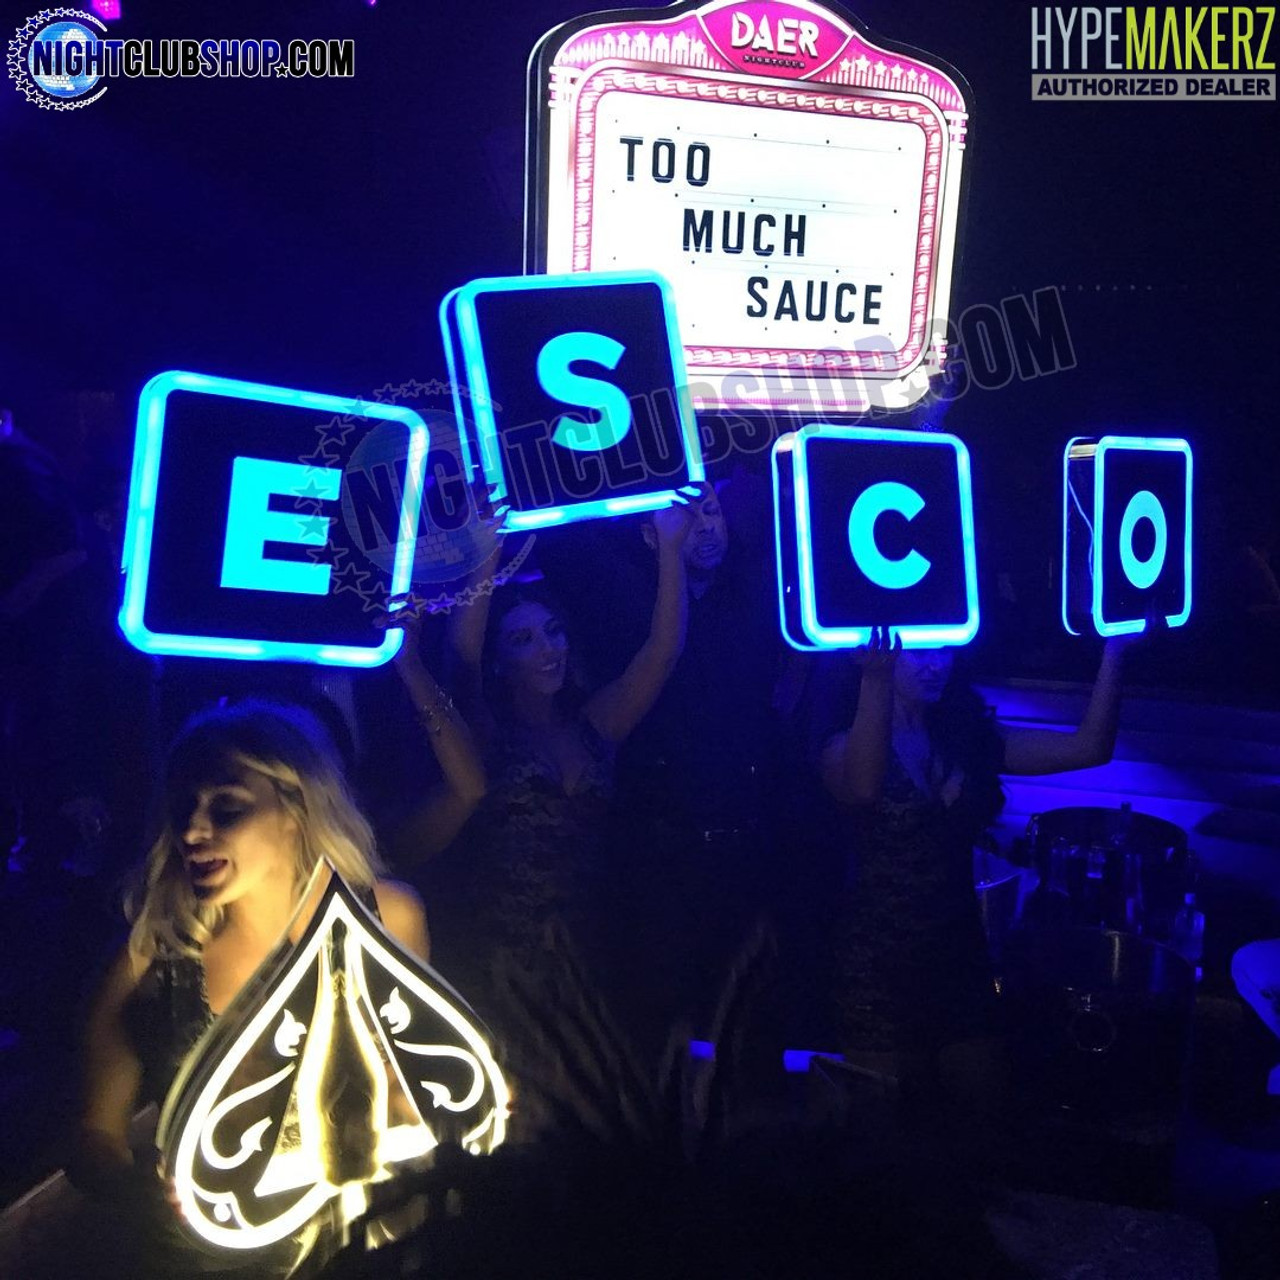 LED, Interchangeable, Lightbox, RGB, Remote, Controlled, RF, ESCO, Nightclub, Nightlife, Club, Bar, Casino, Lounge, Celebration, Custom, Branding